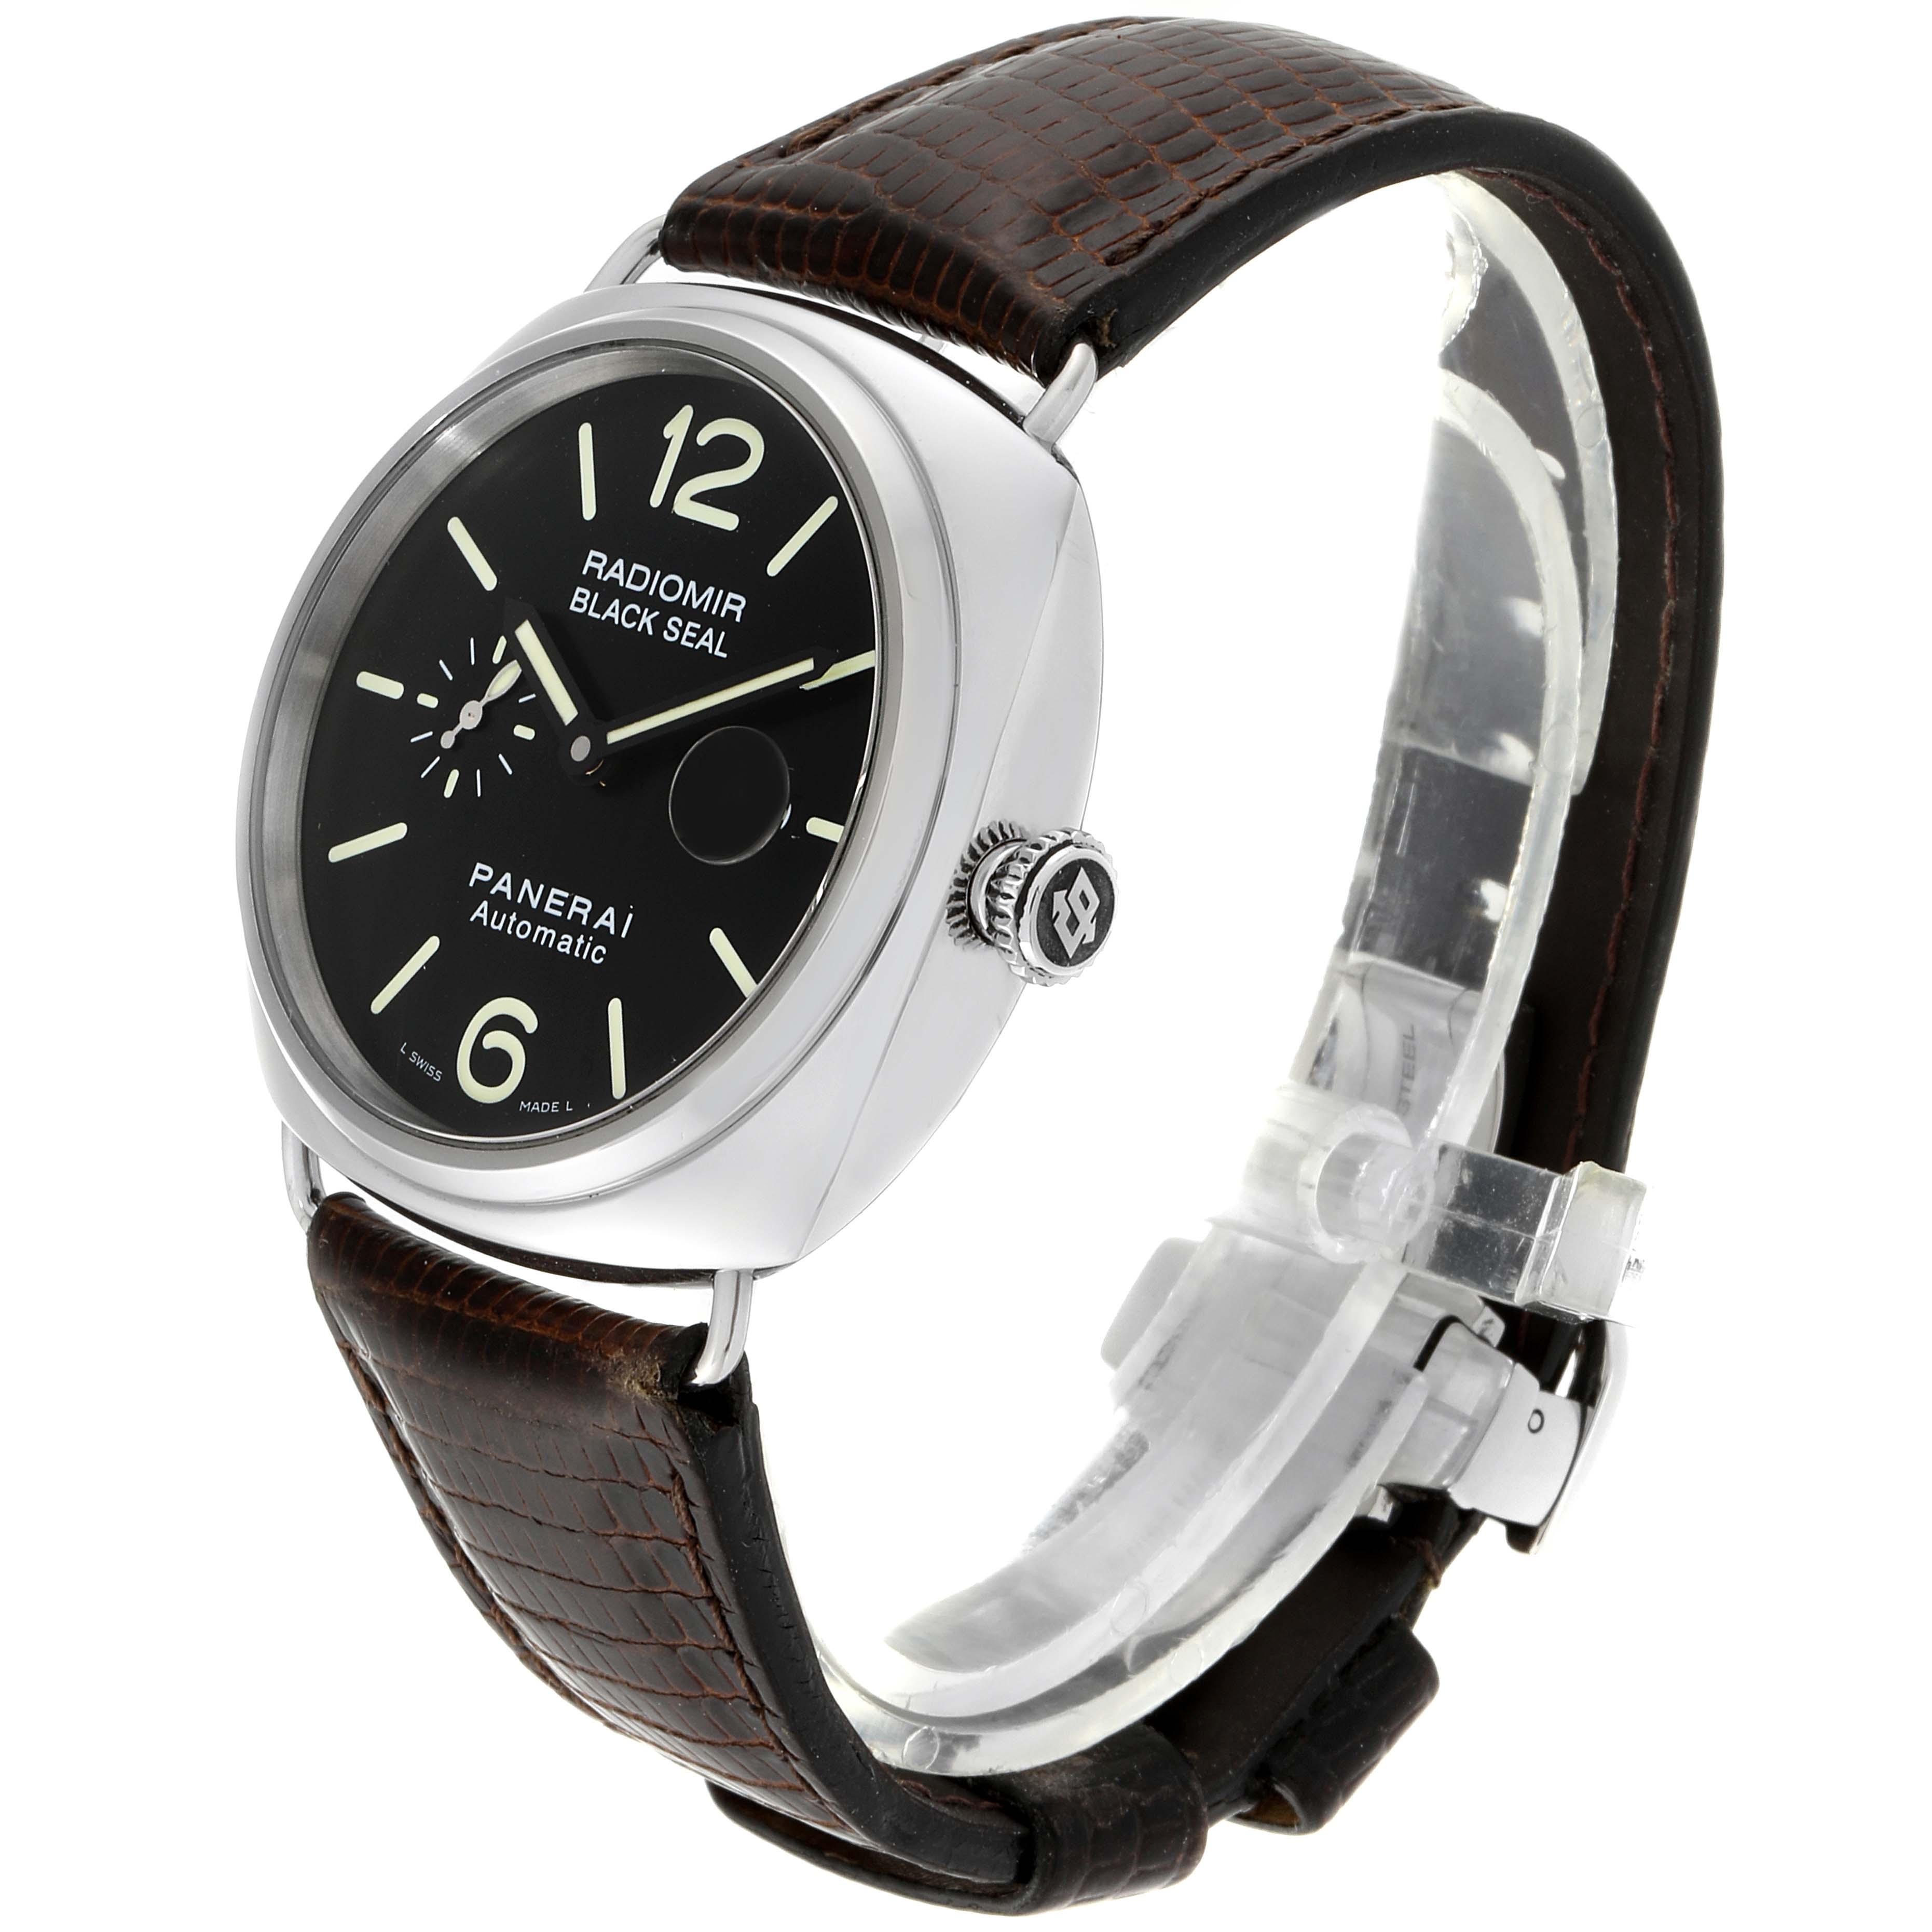 Panerai Radiomir Black Seal Automatic Steel Mens Watch PAM00287 Box Papers SwissWatchExpo